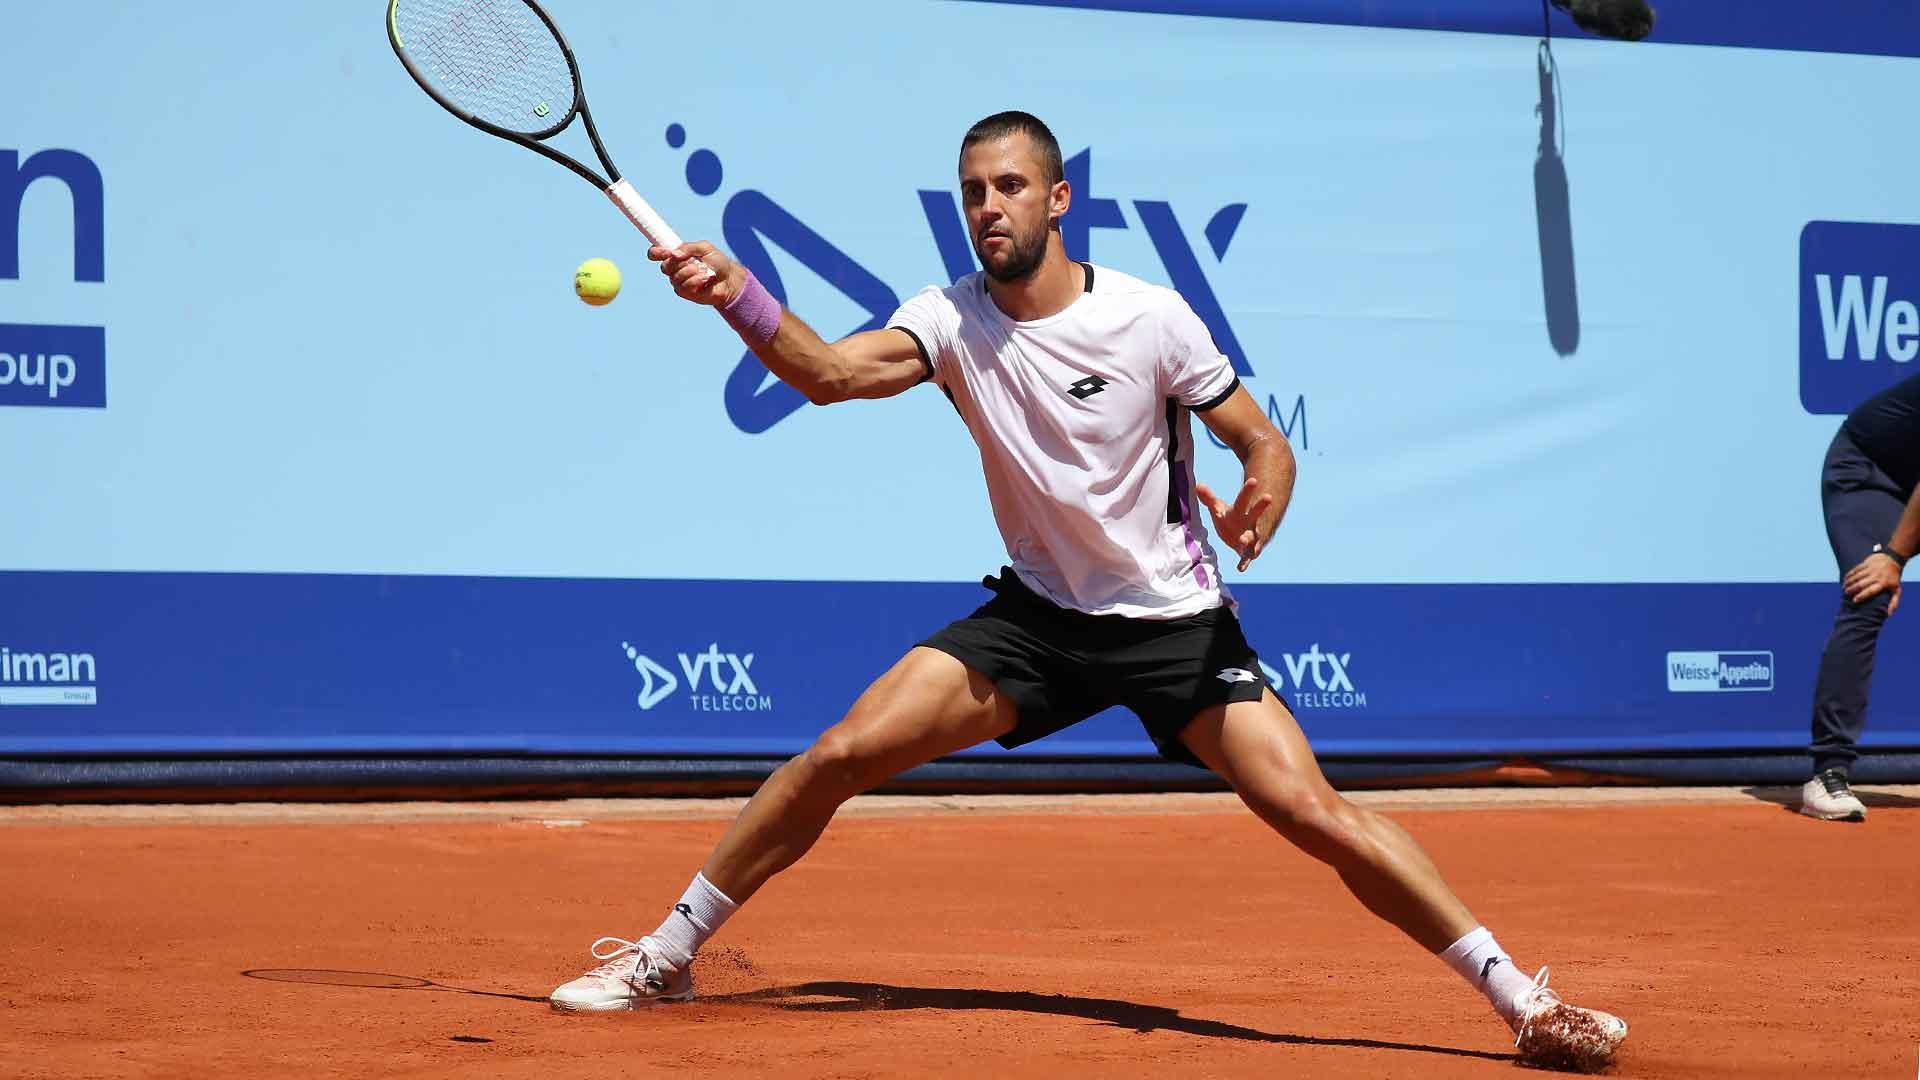 Gstaad Open 2021: Laslo Djere vs Arthur Rinderknech Tennis Pick and Prediction